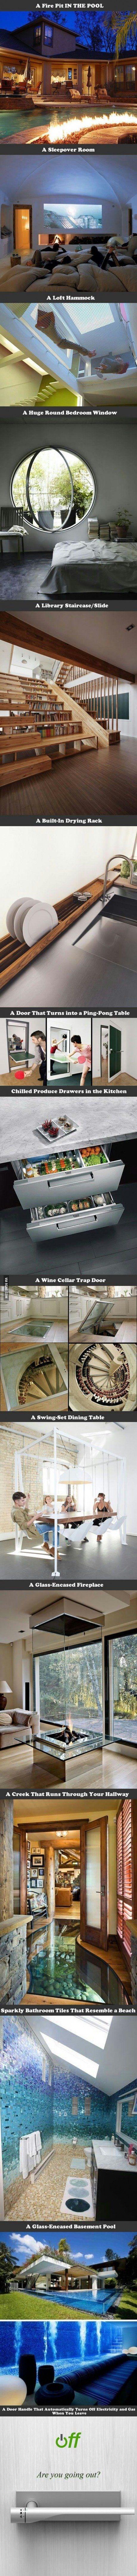 Cool ideas.